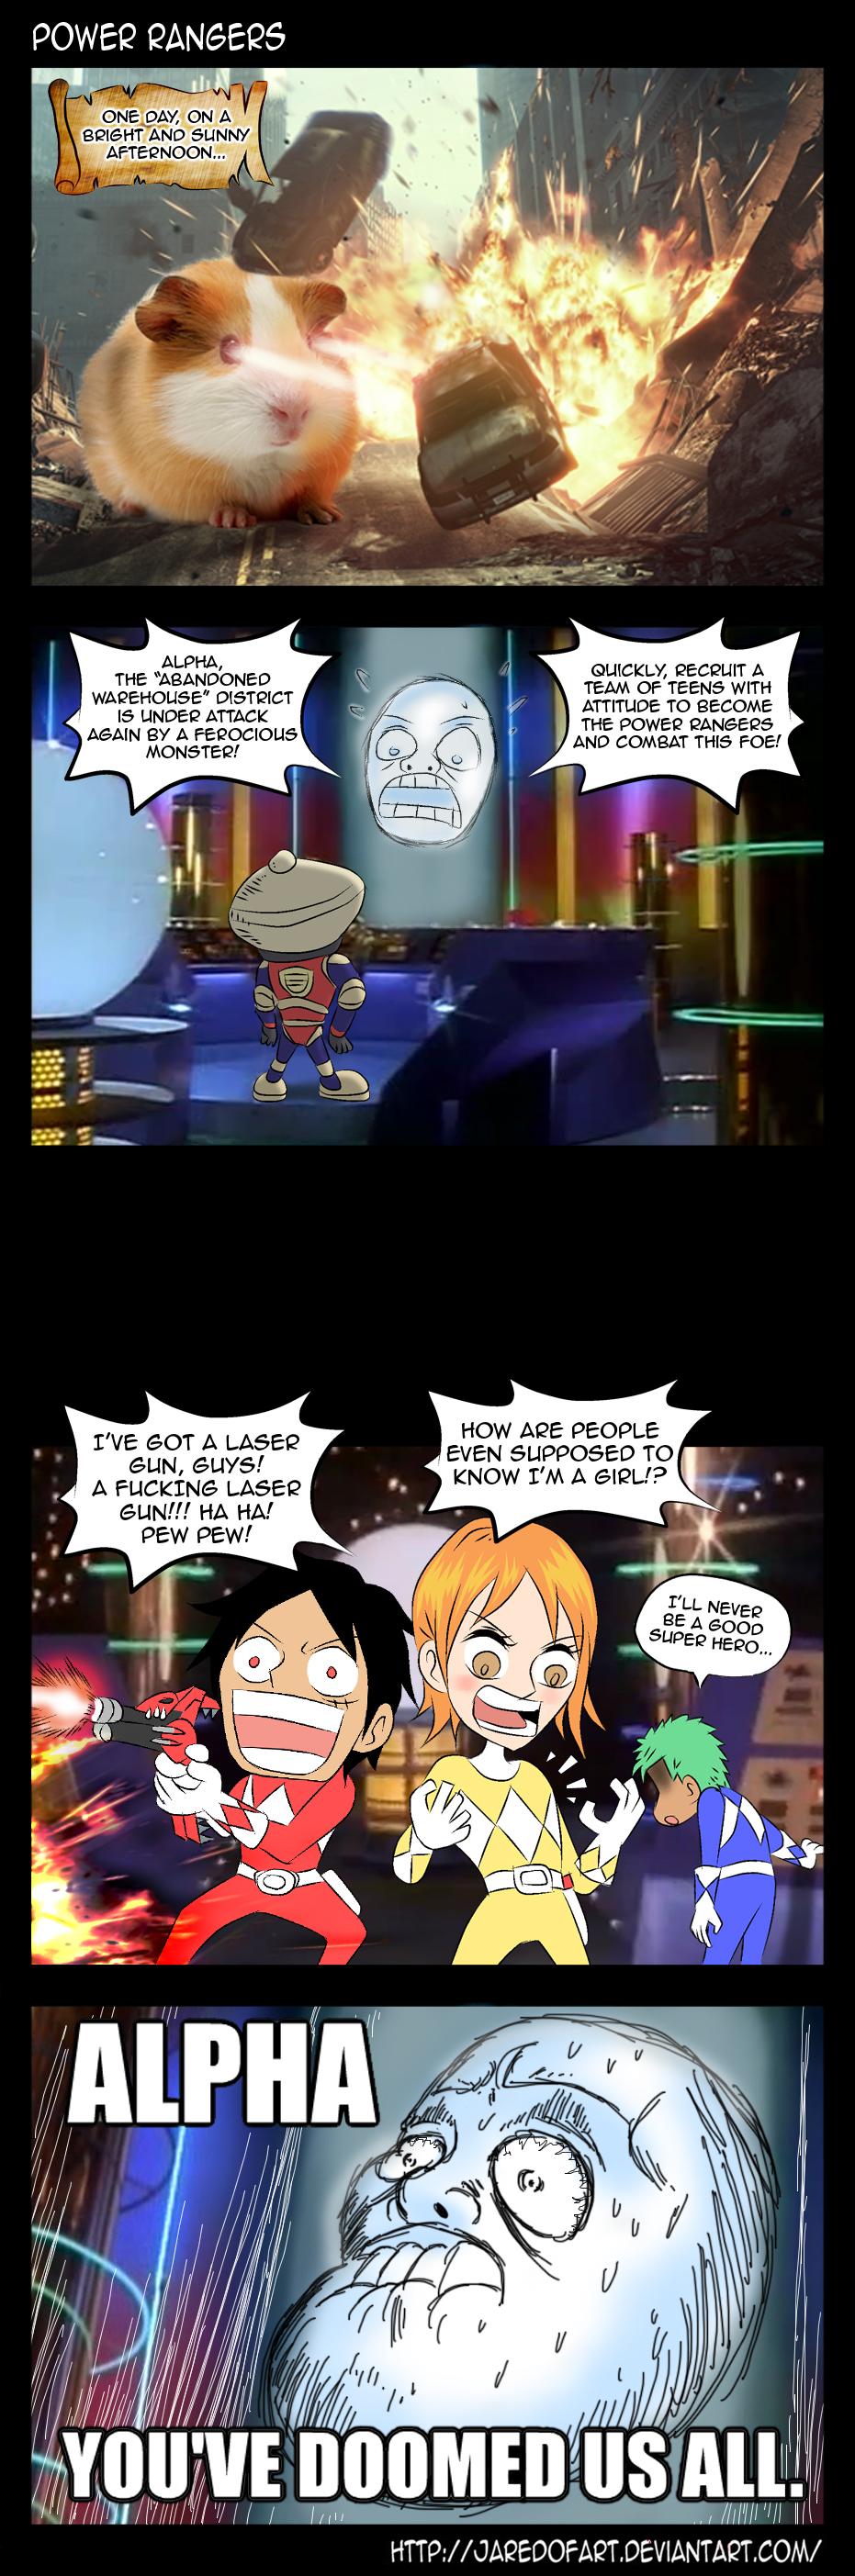 Special - Power Rangers by JaredofArt